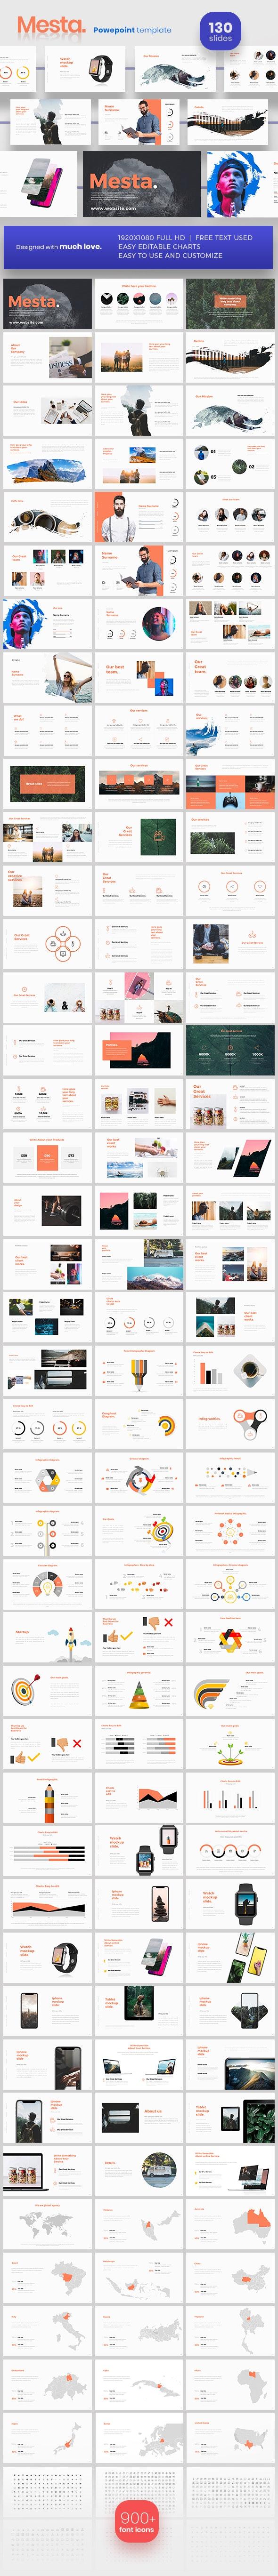 Mesta Powerpoint Presentation Template - PowerPoint Templates Presentation Templates